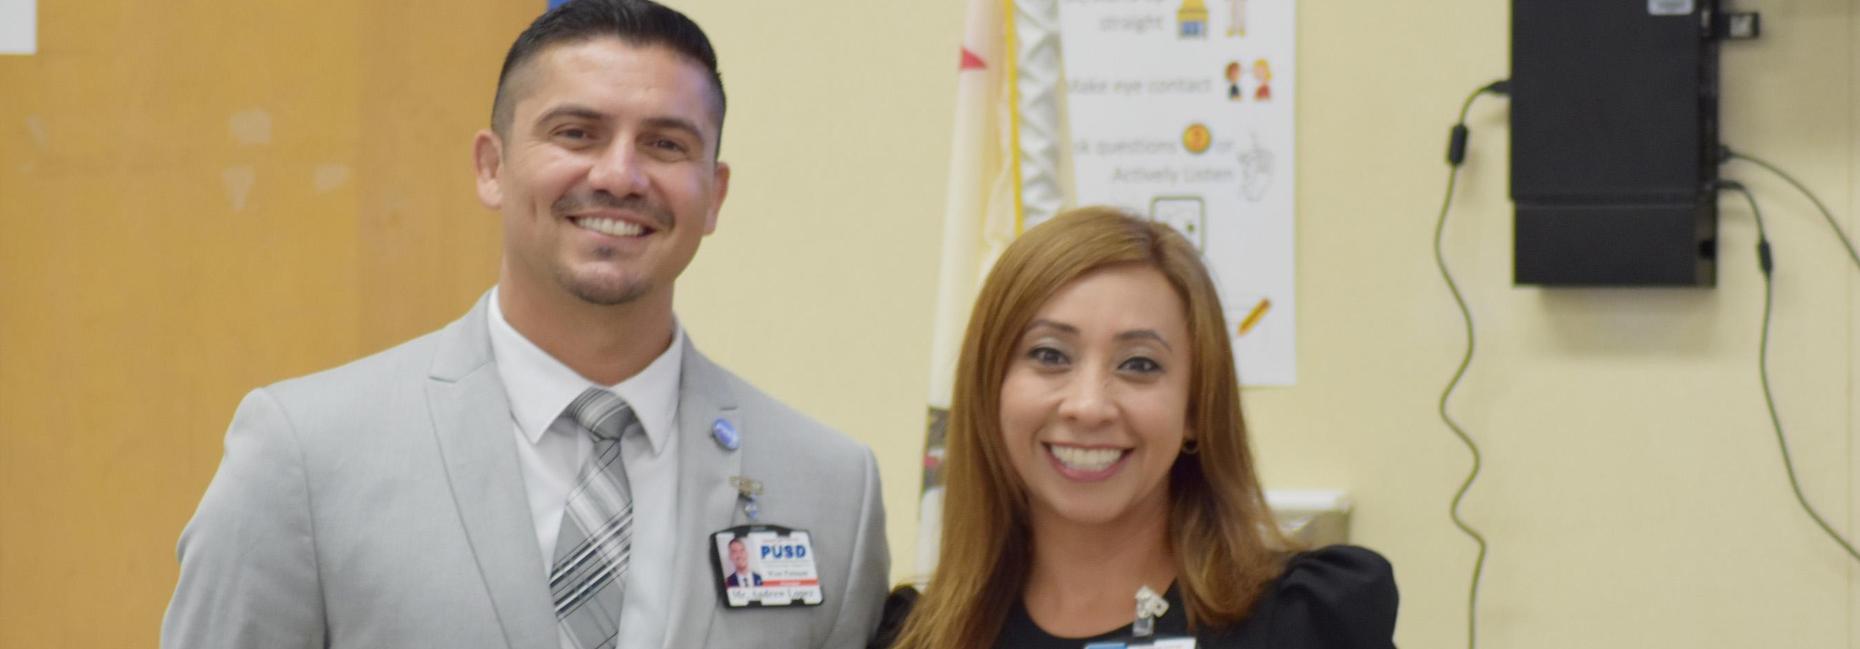 Mr. Lopez and Mrs. Ortiz